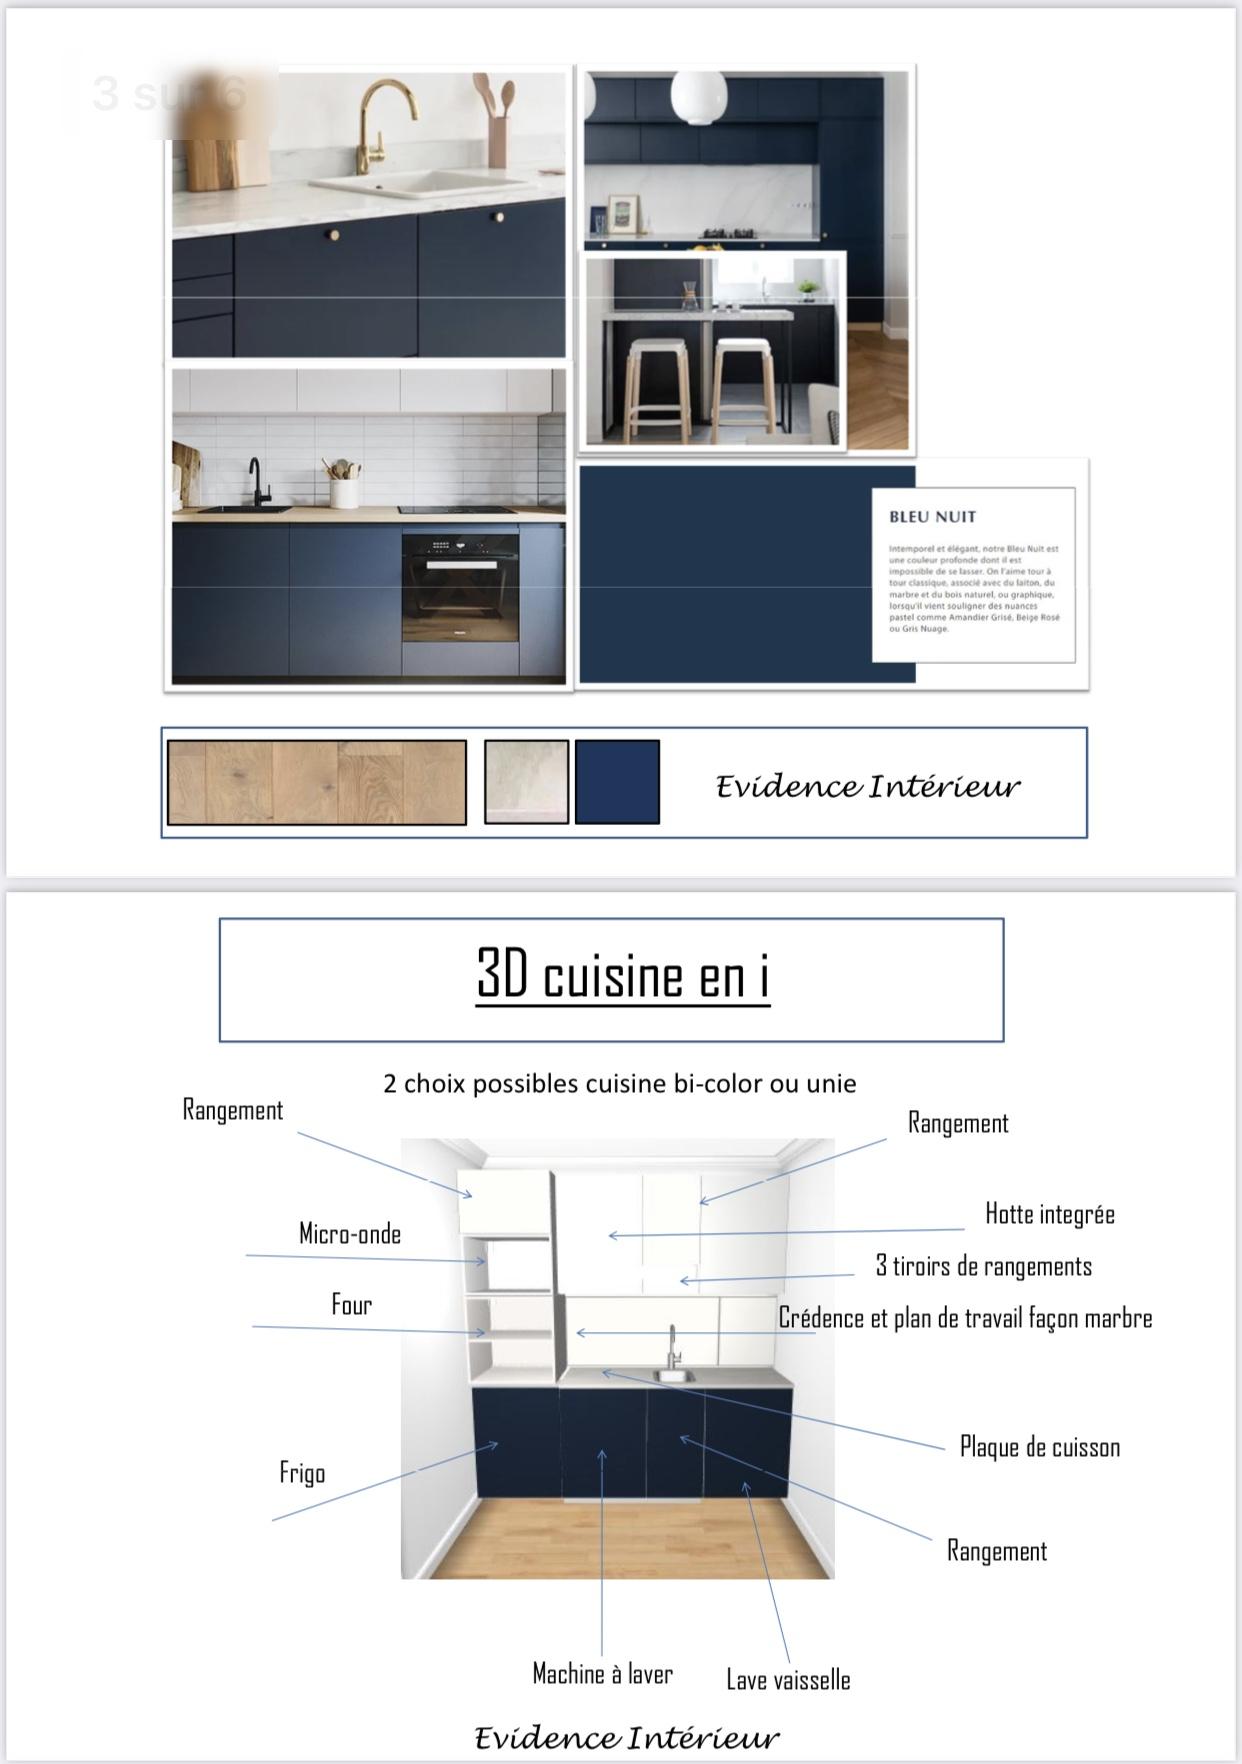 Projet 3D cuisine en i studio Anglet